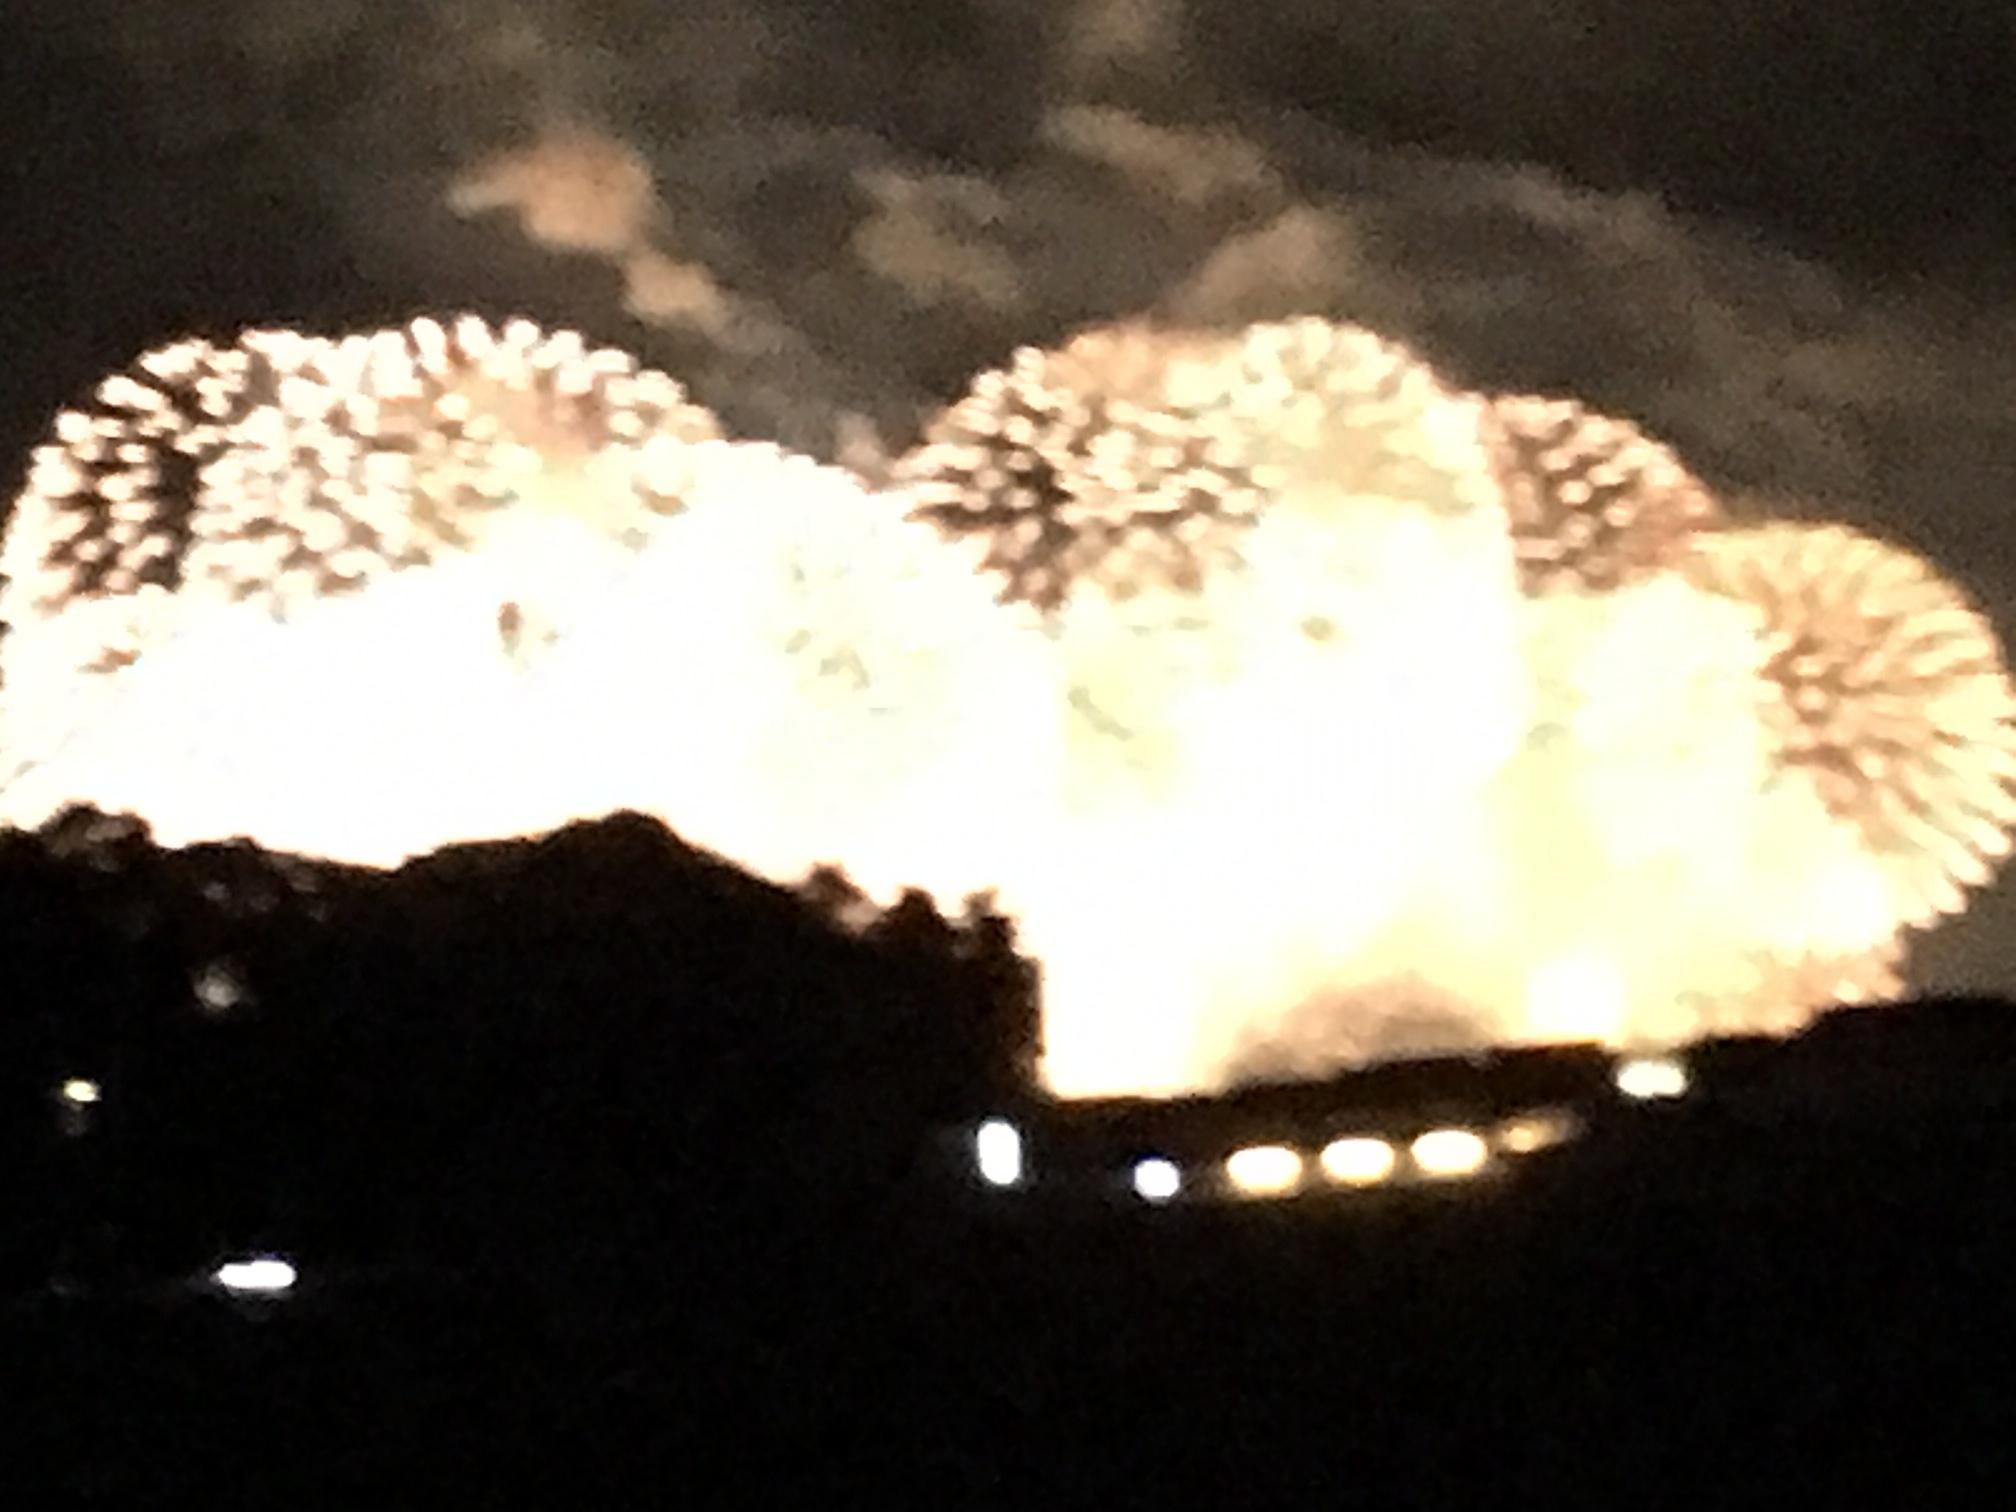 琵琶湖の花火_b0236472_22301655.jpeg